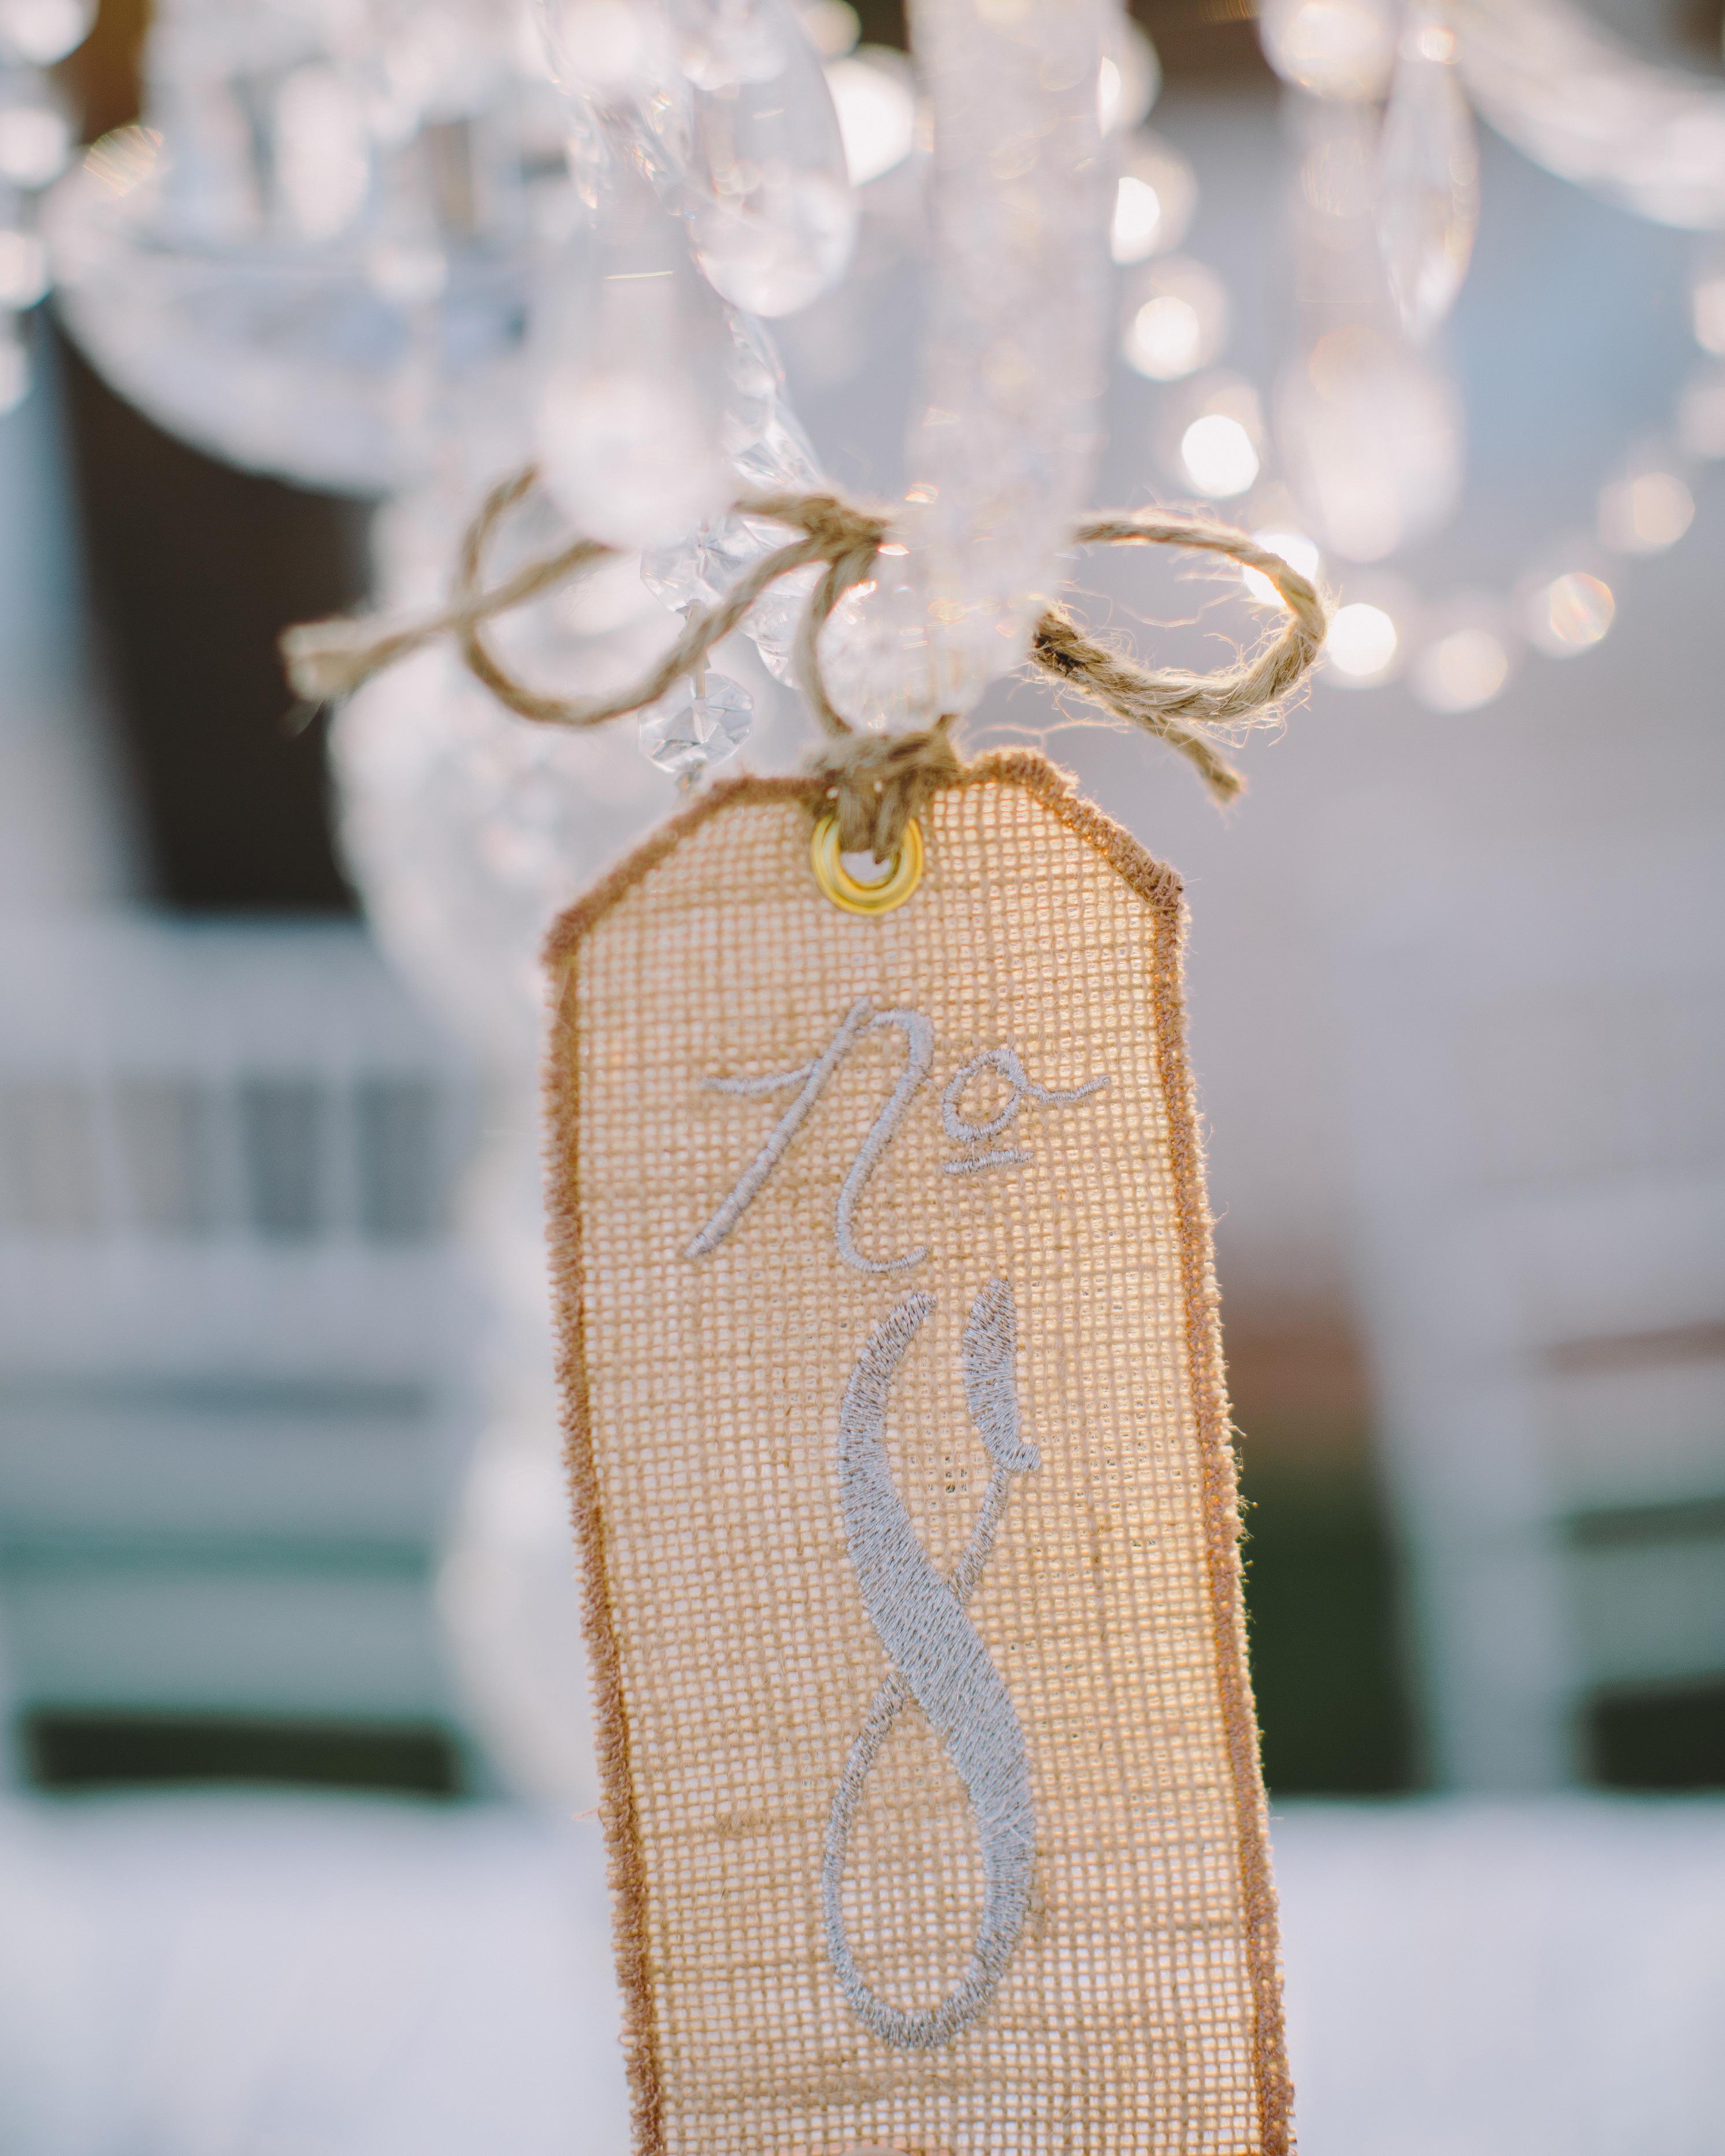 teresa-amanda-wedding-tablenumber-0097-s111694-1114.jpg